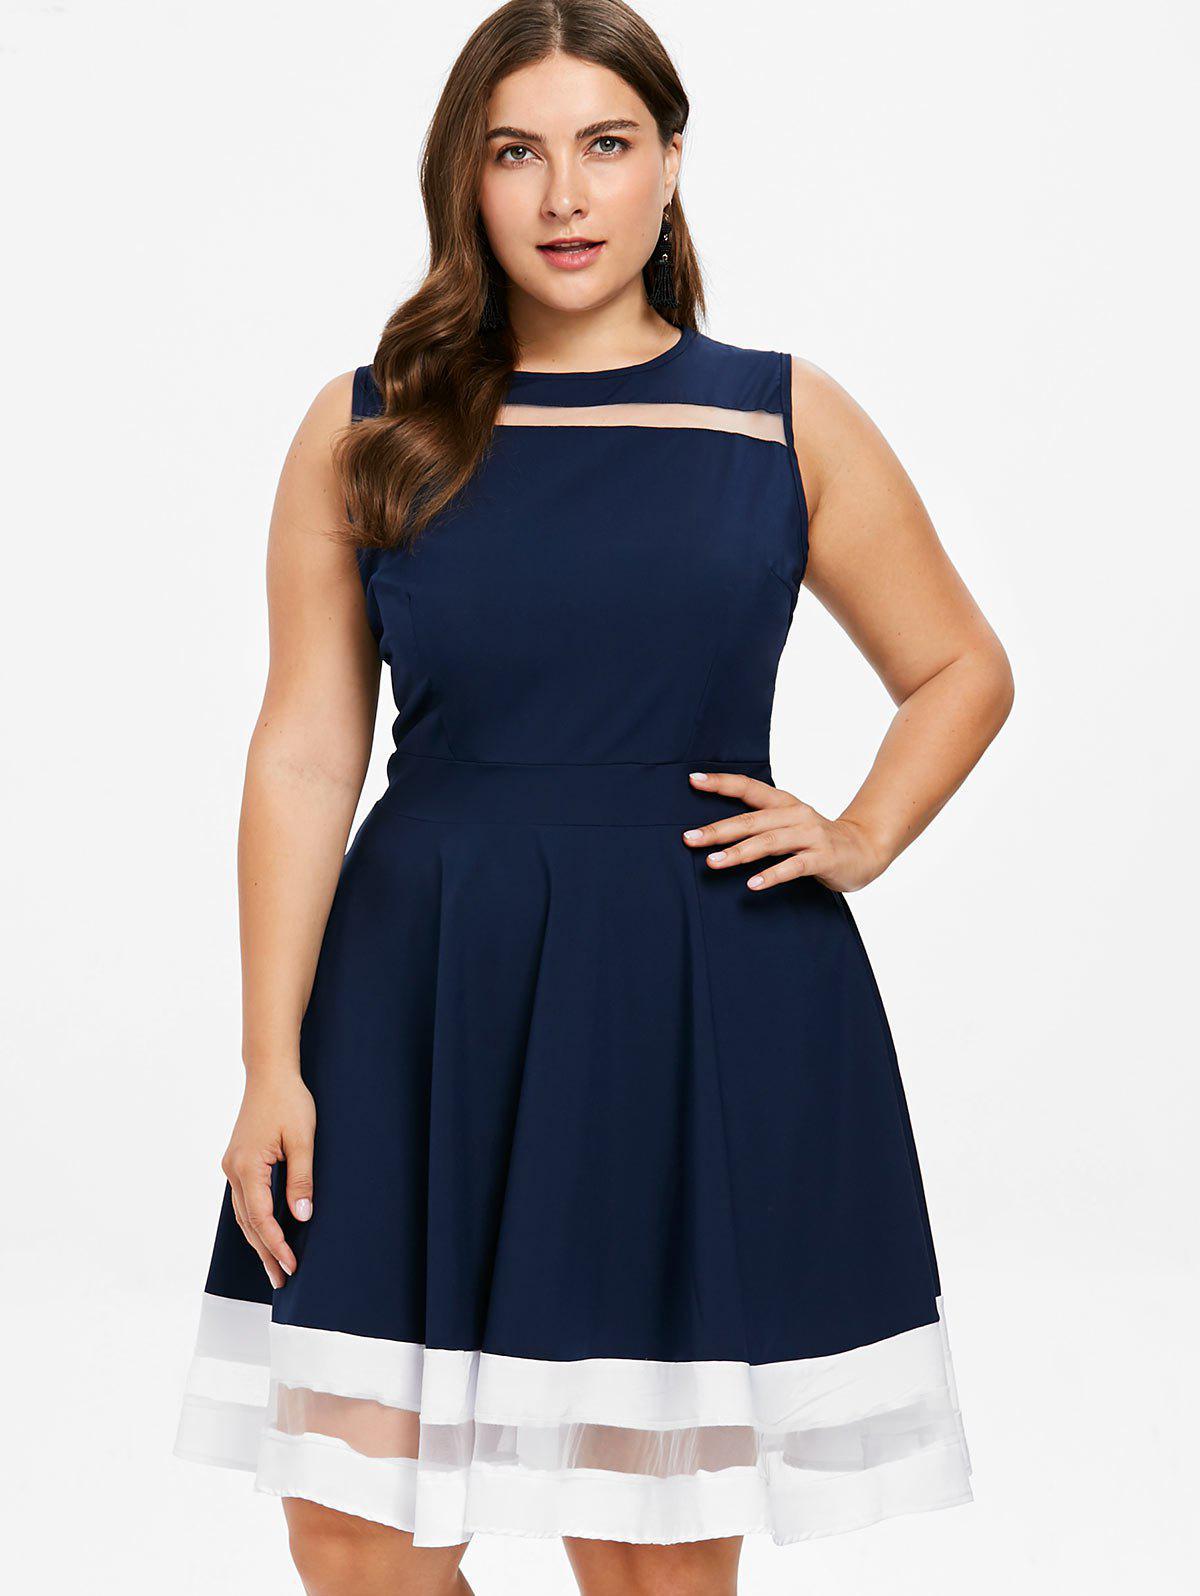 Mesh Trim Plus Size Skater Dress